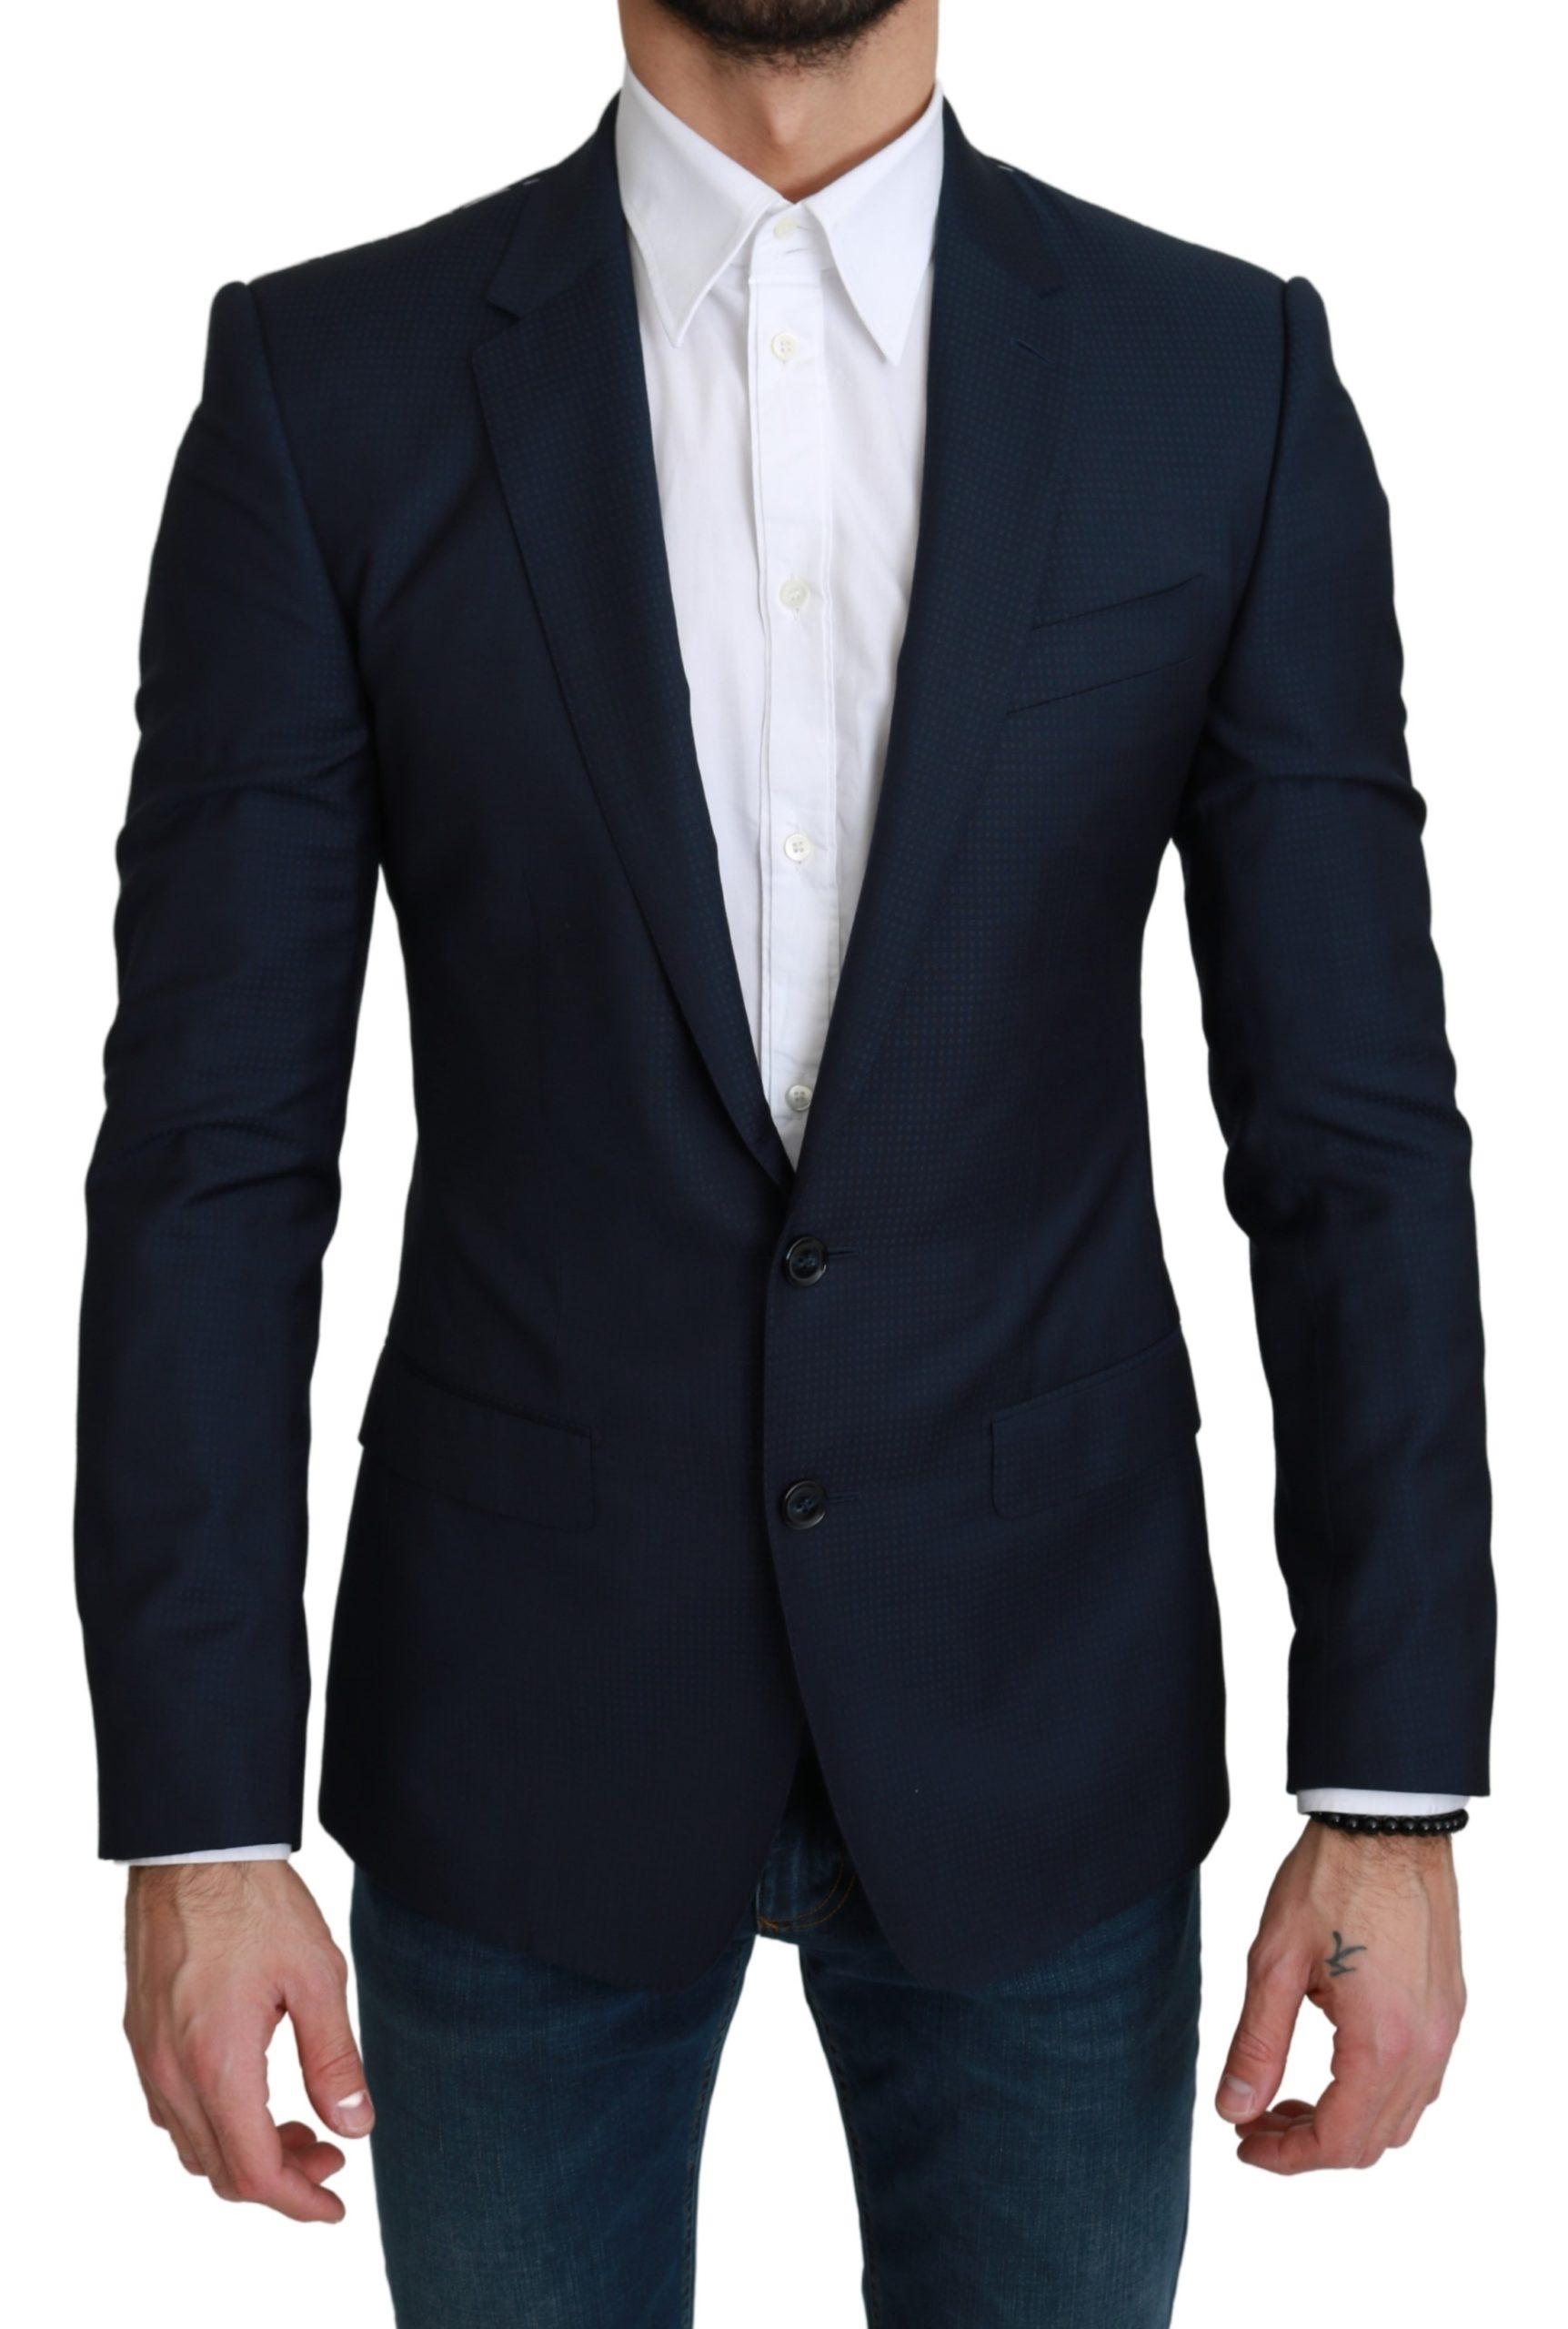 Dolce & Gabbana Men's Single Breasted MARTINI Blazer Navy Blue KOS1746 - IT44   XS